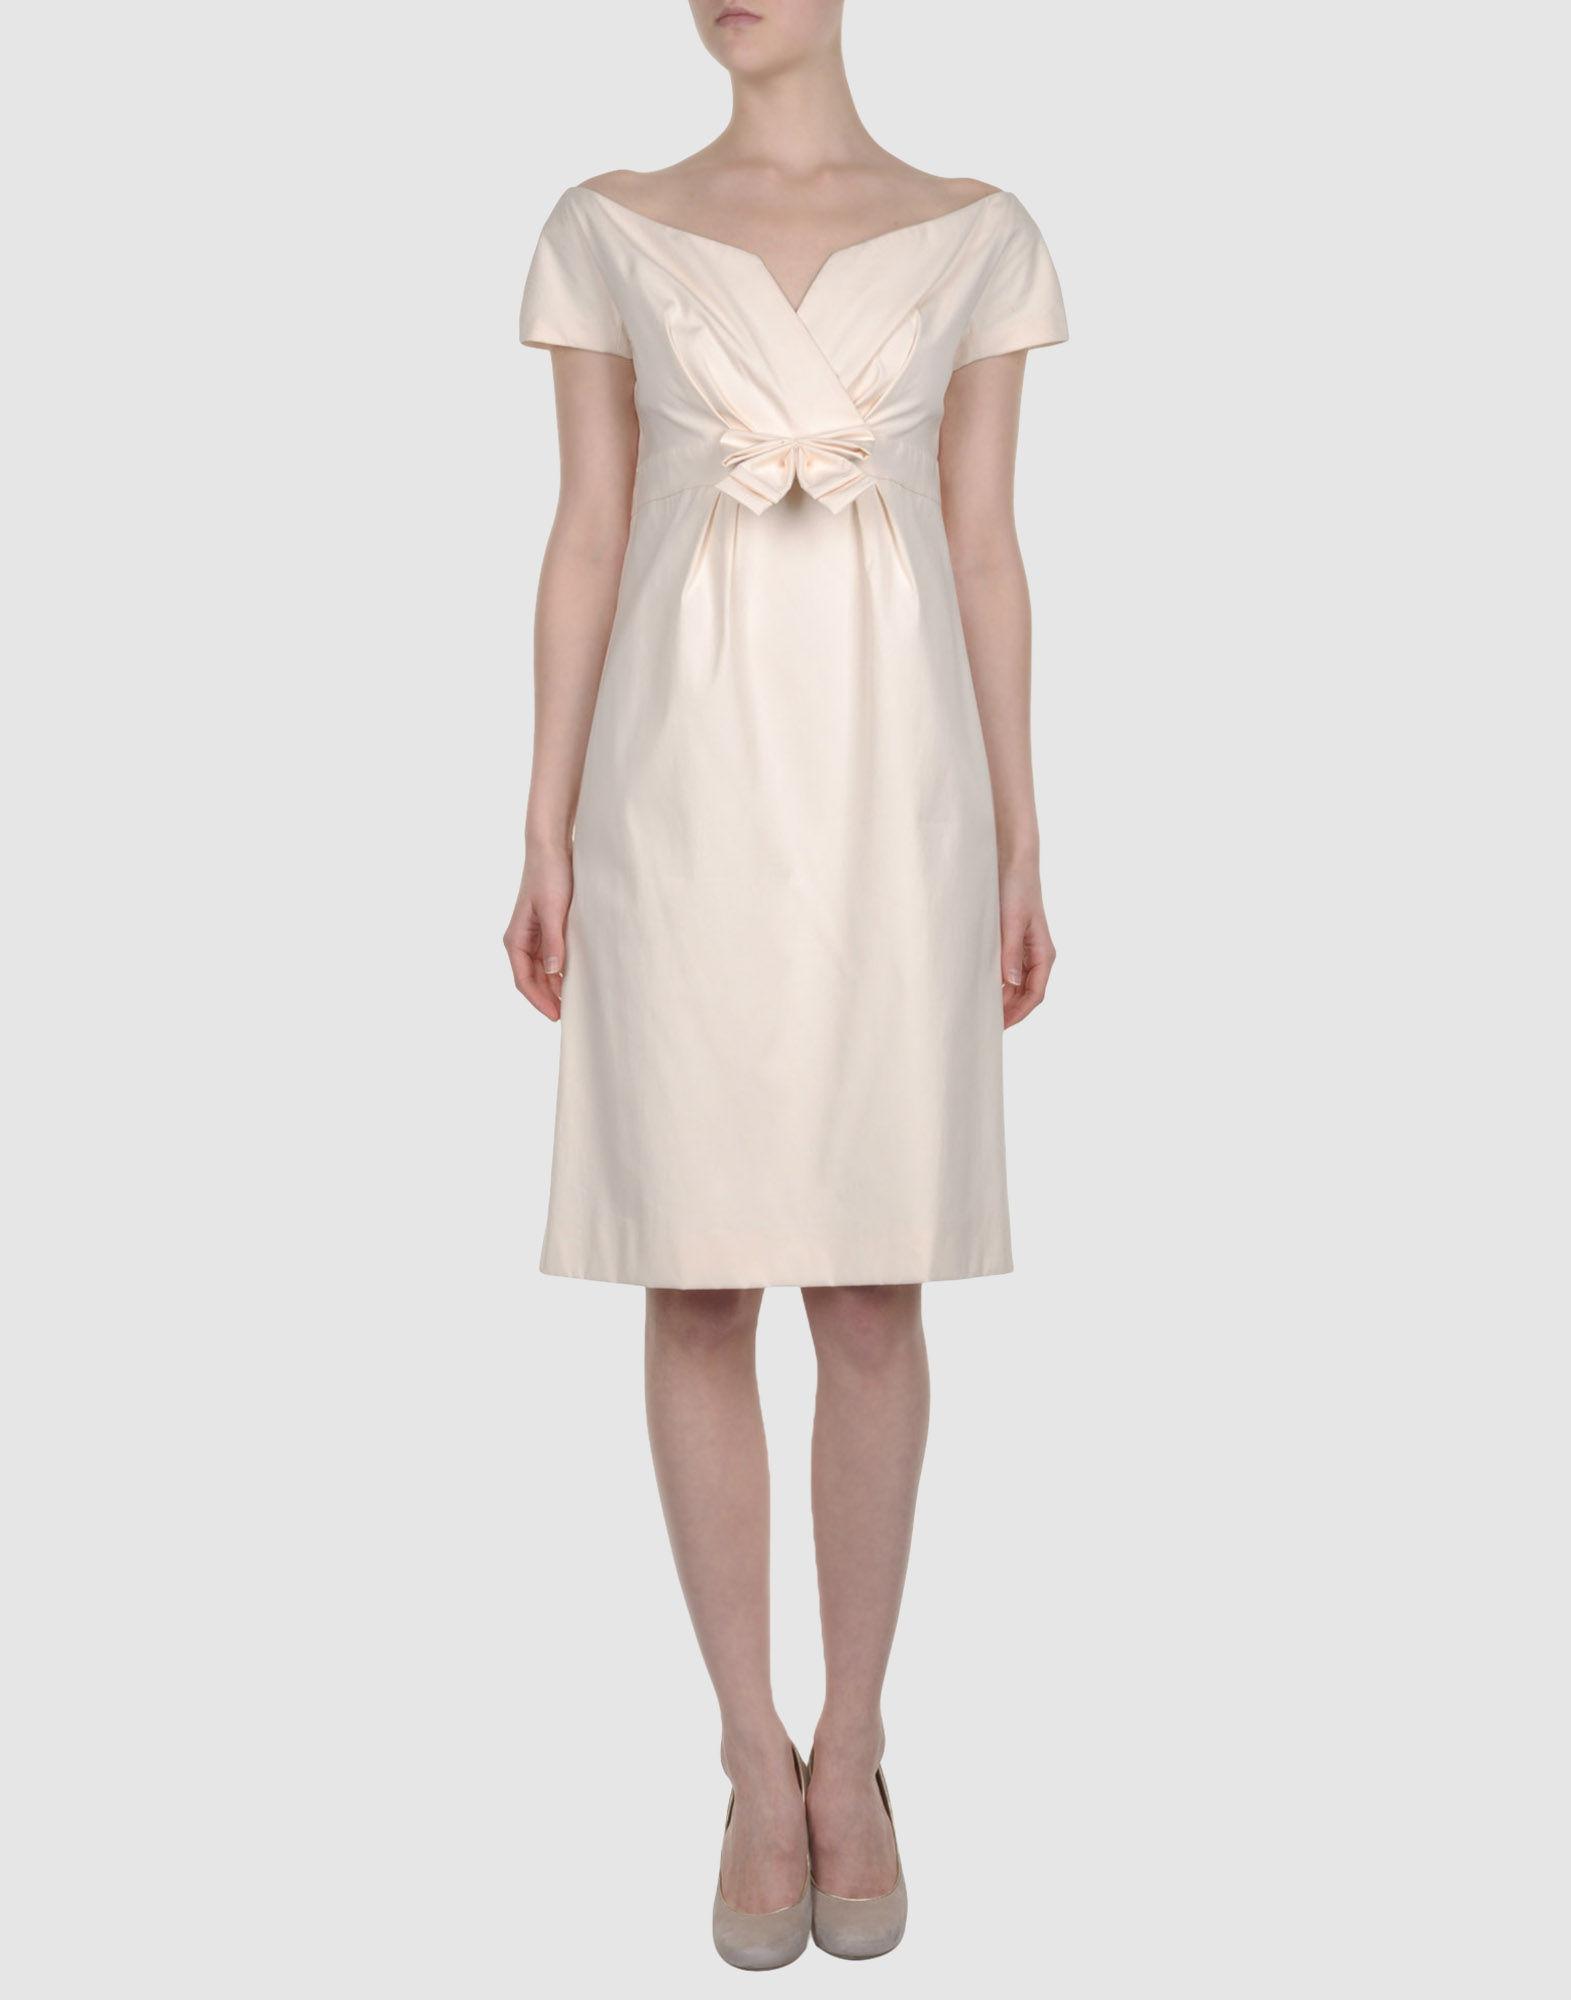 dior short dresses - photo #8